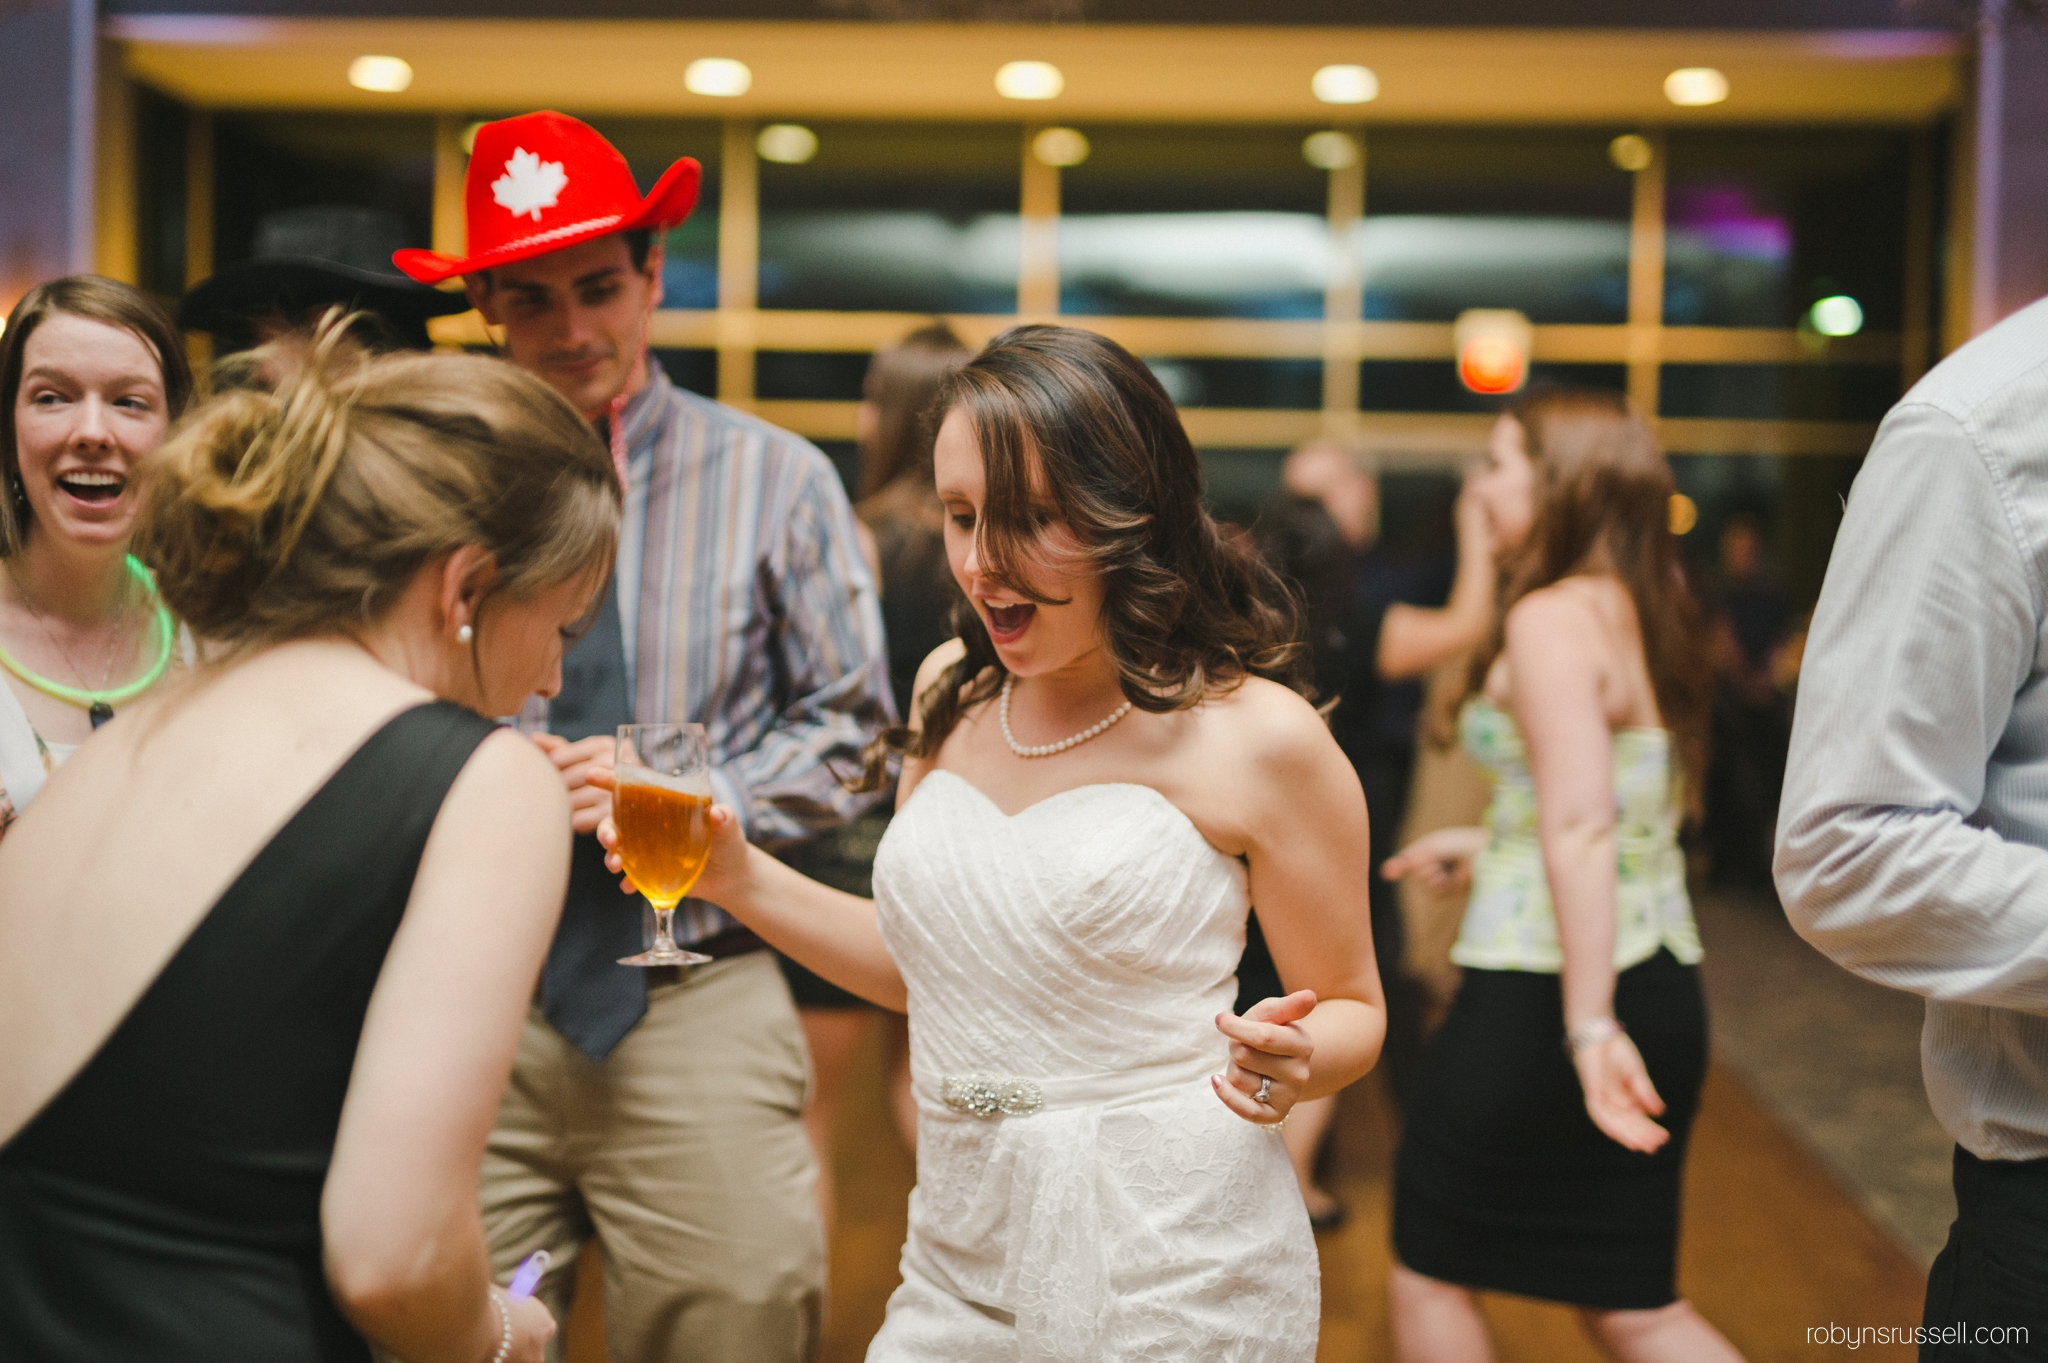 73-bride-having-fun-on-wedding-day.jpg